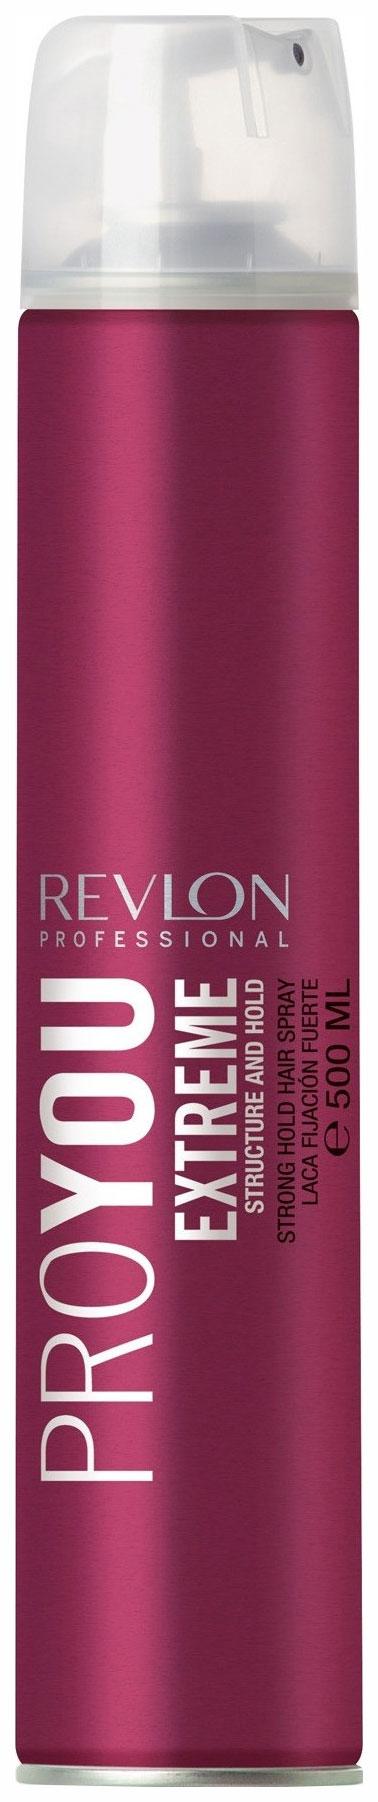 Лак для волос Revlon Professional Pro You Extra Strong Hair Spray Extreme 500 мл